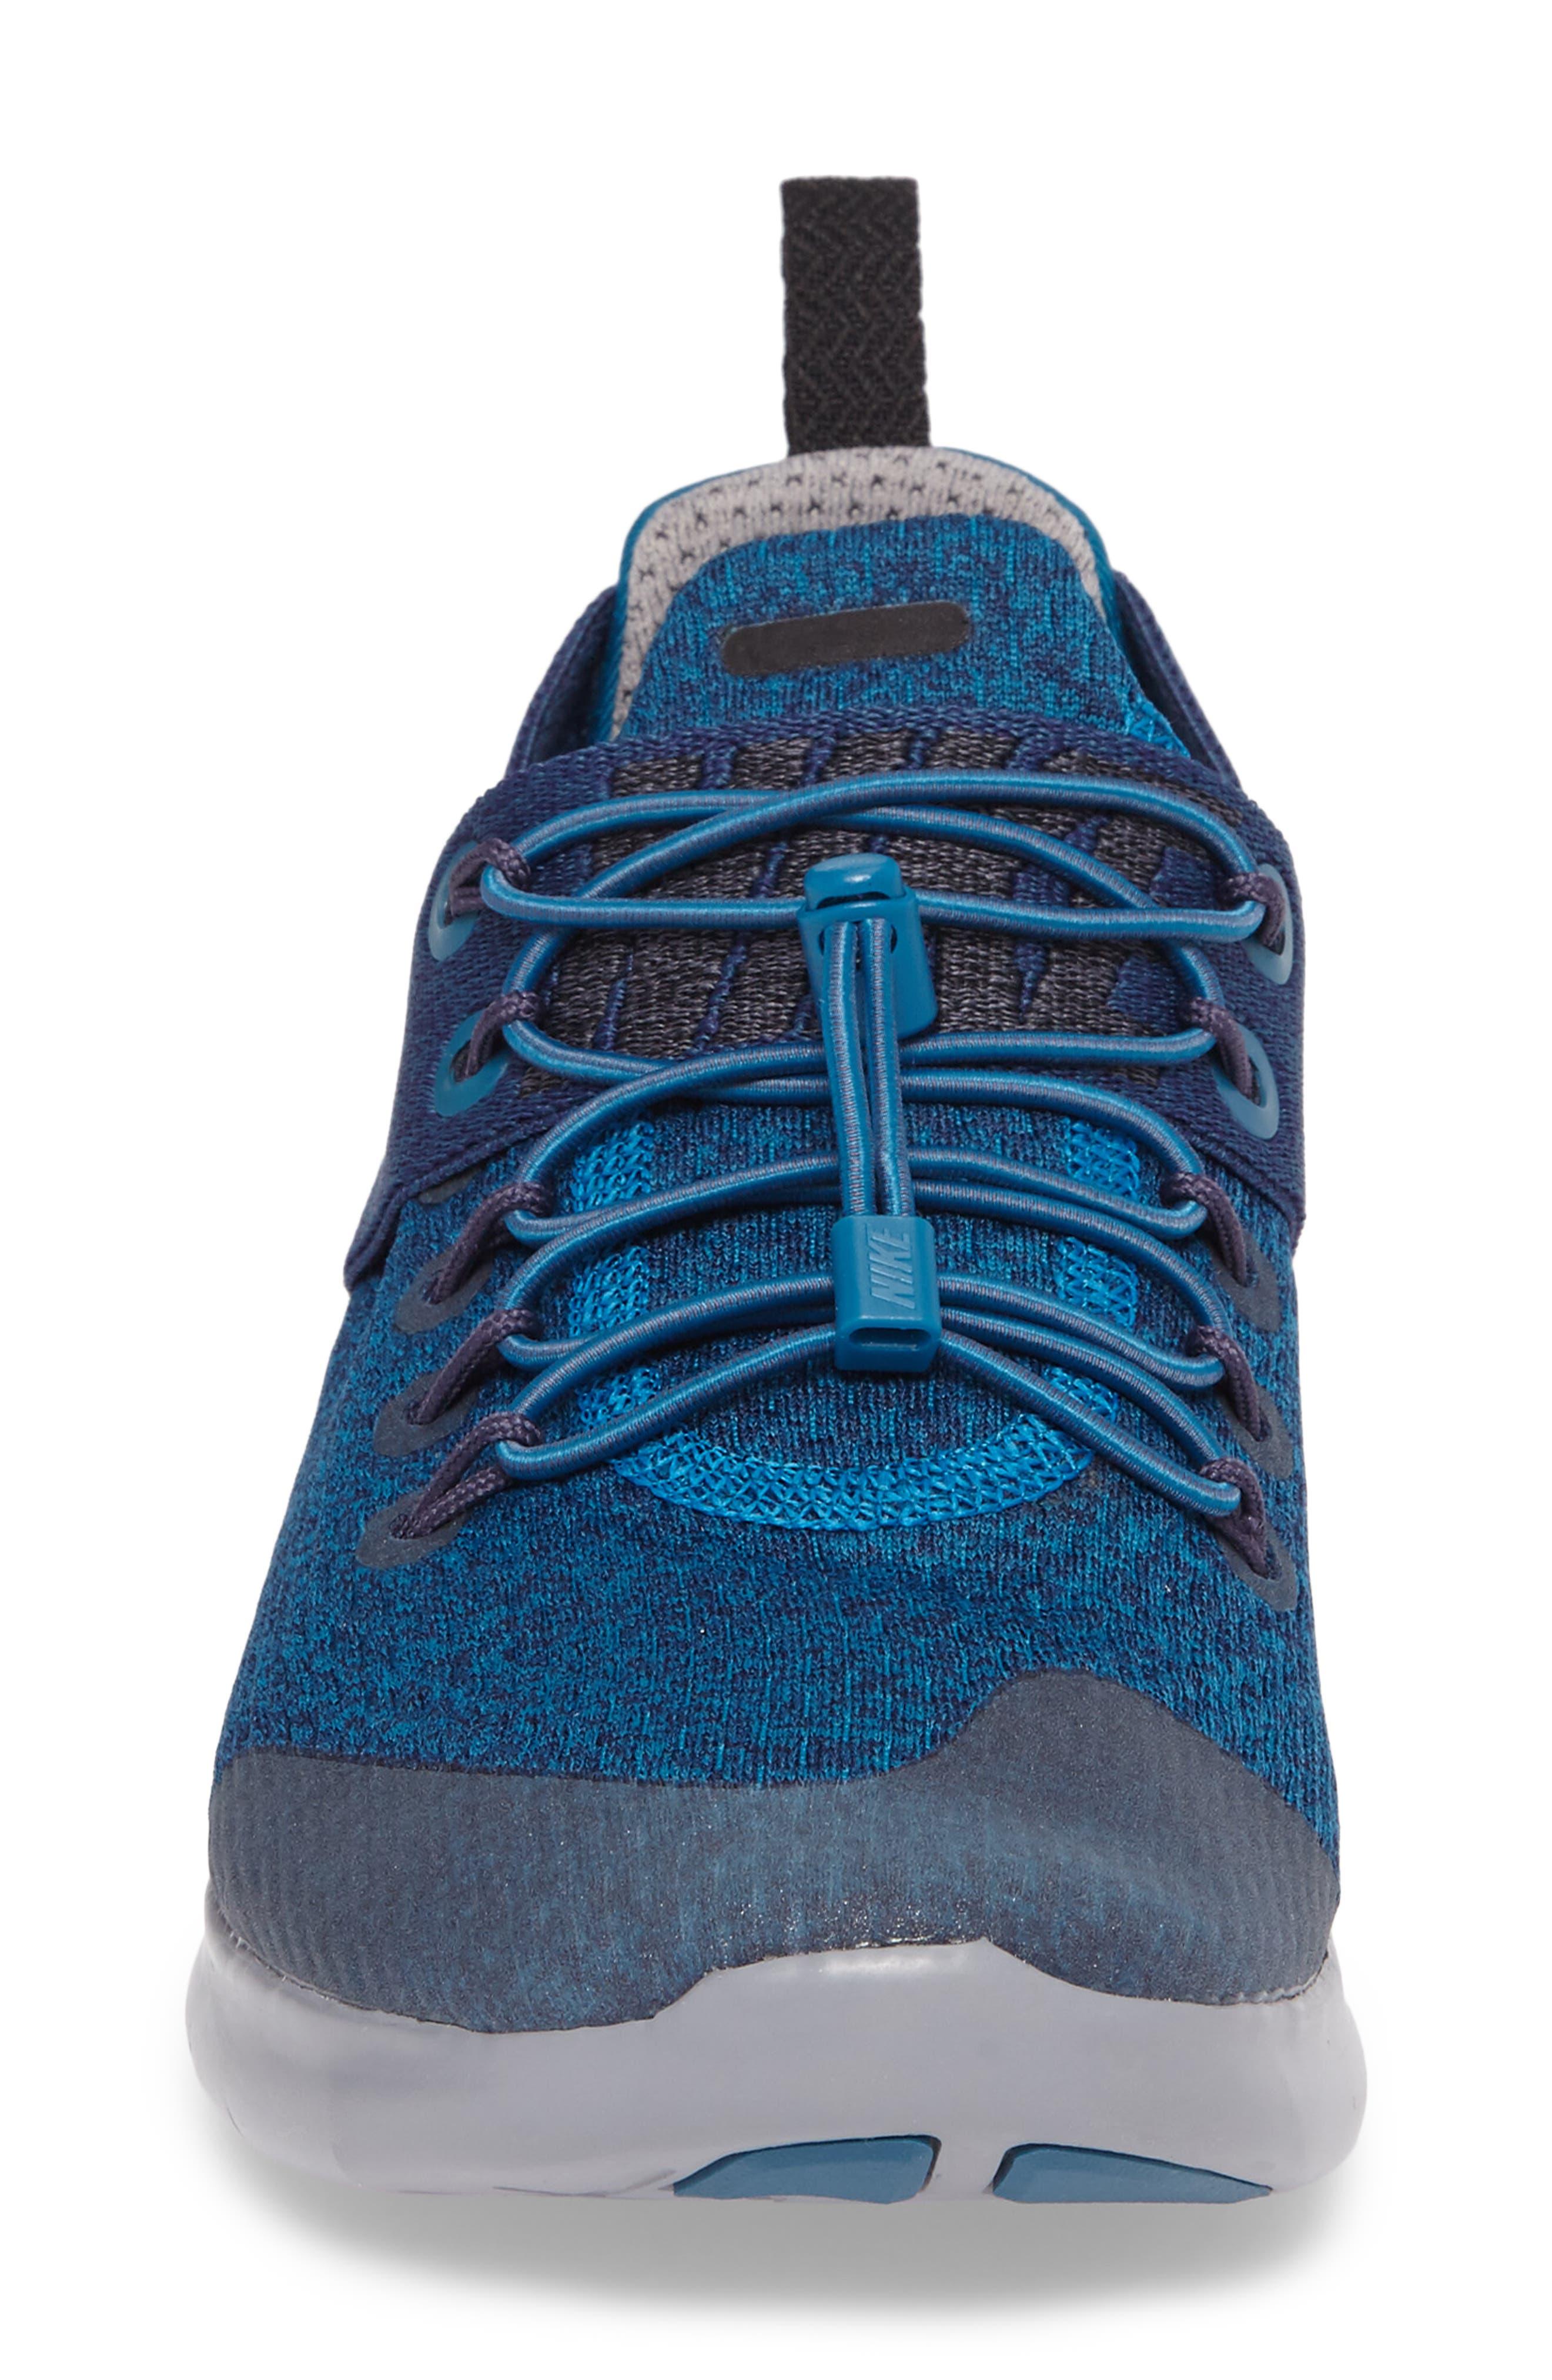 Free RN Commuter 2017 Premium Running Shoe,                             Alternate thumbnail 4, color,                             Green / Black/ Cobblestone